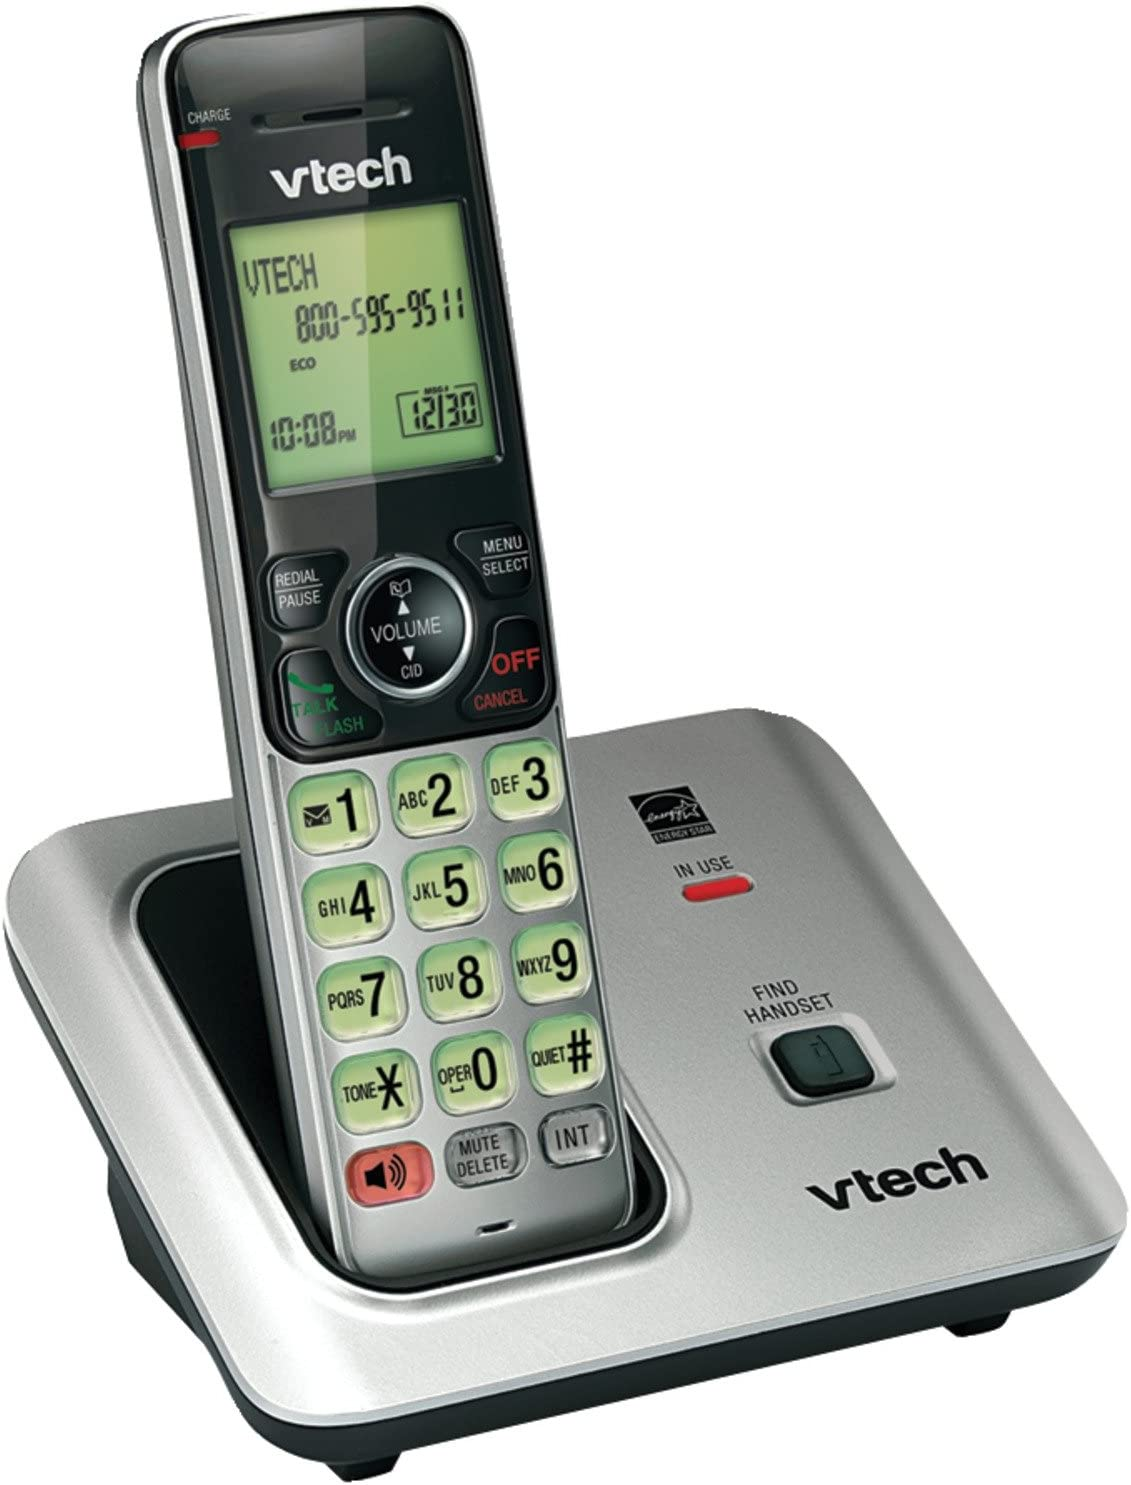 VTech CS6619 Dect 6.0 1-Handset Cordless Telephone: Amazon.es: Electrónica